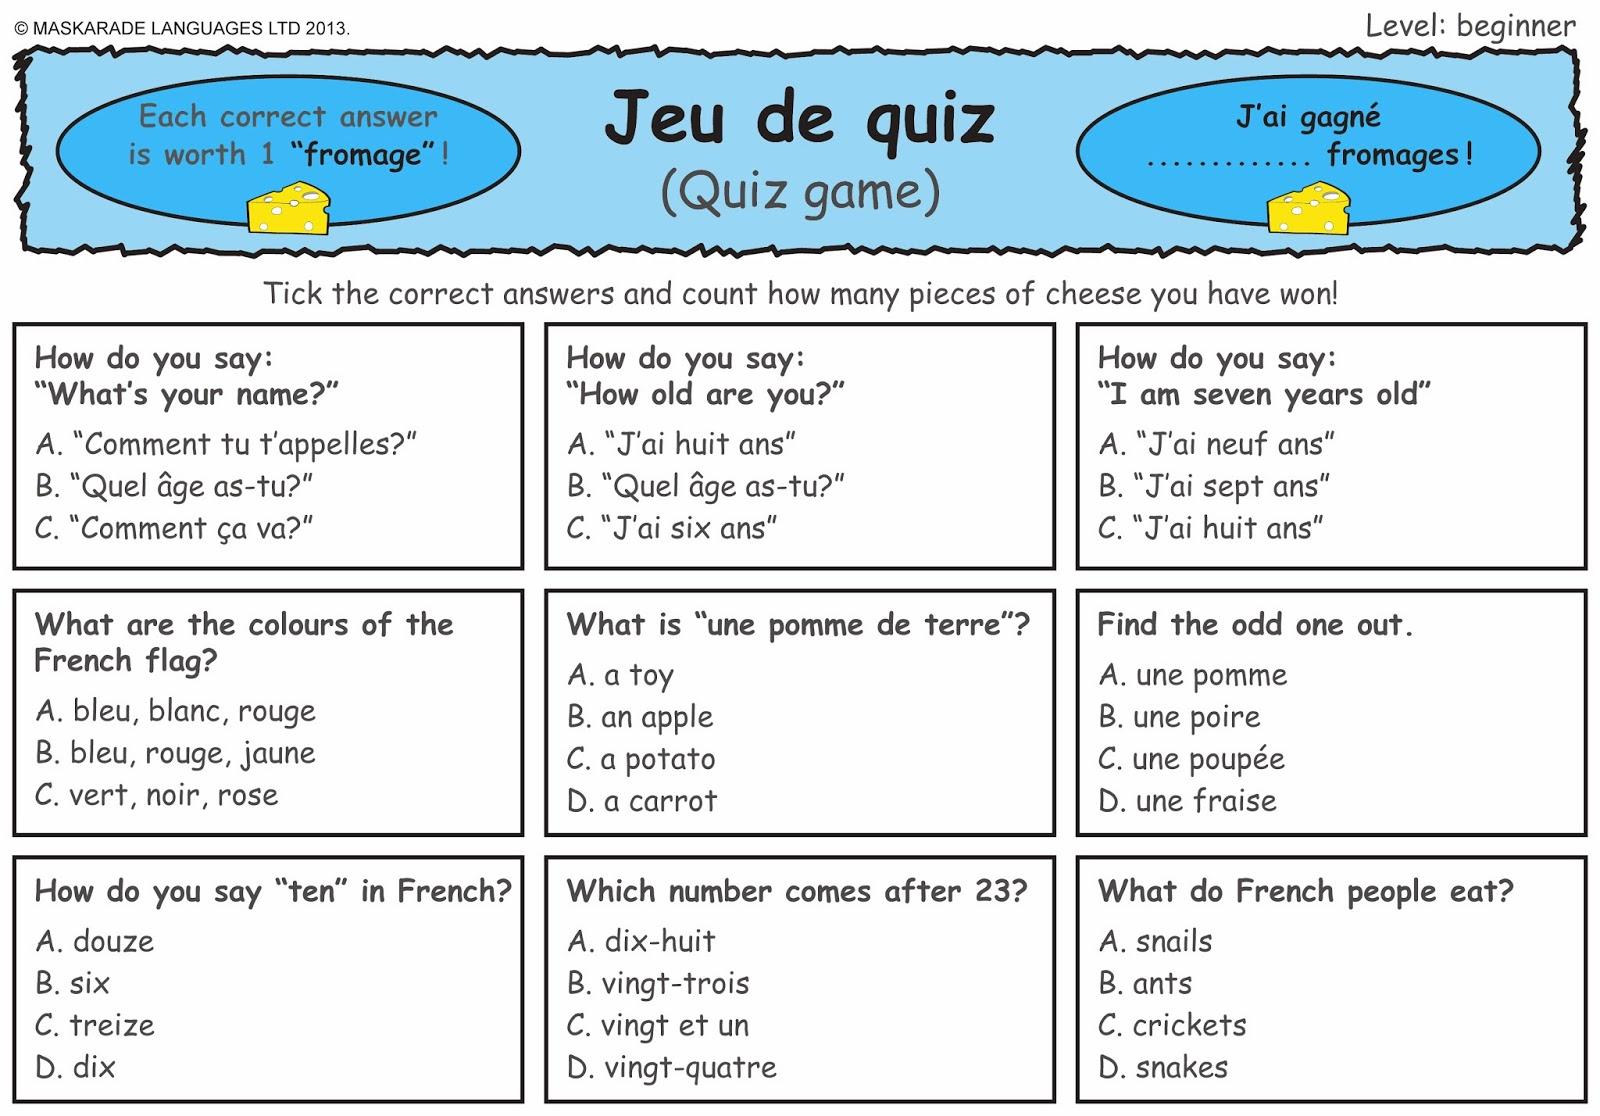 Printables Learning French Worksheets printables french worksheets for beginners safarmediapps maskarade languages quiz level beginner bitesize ks2 1 learn with